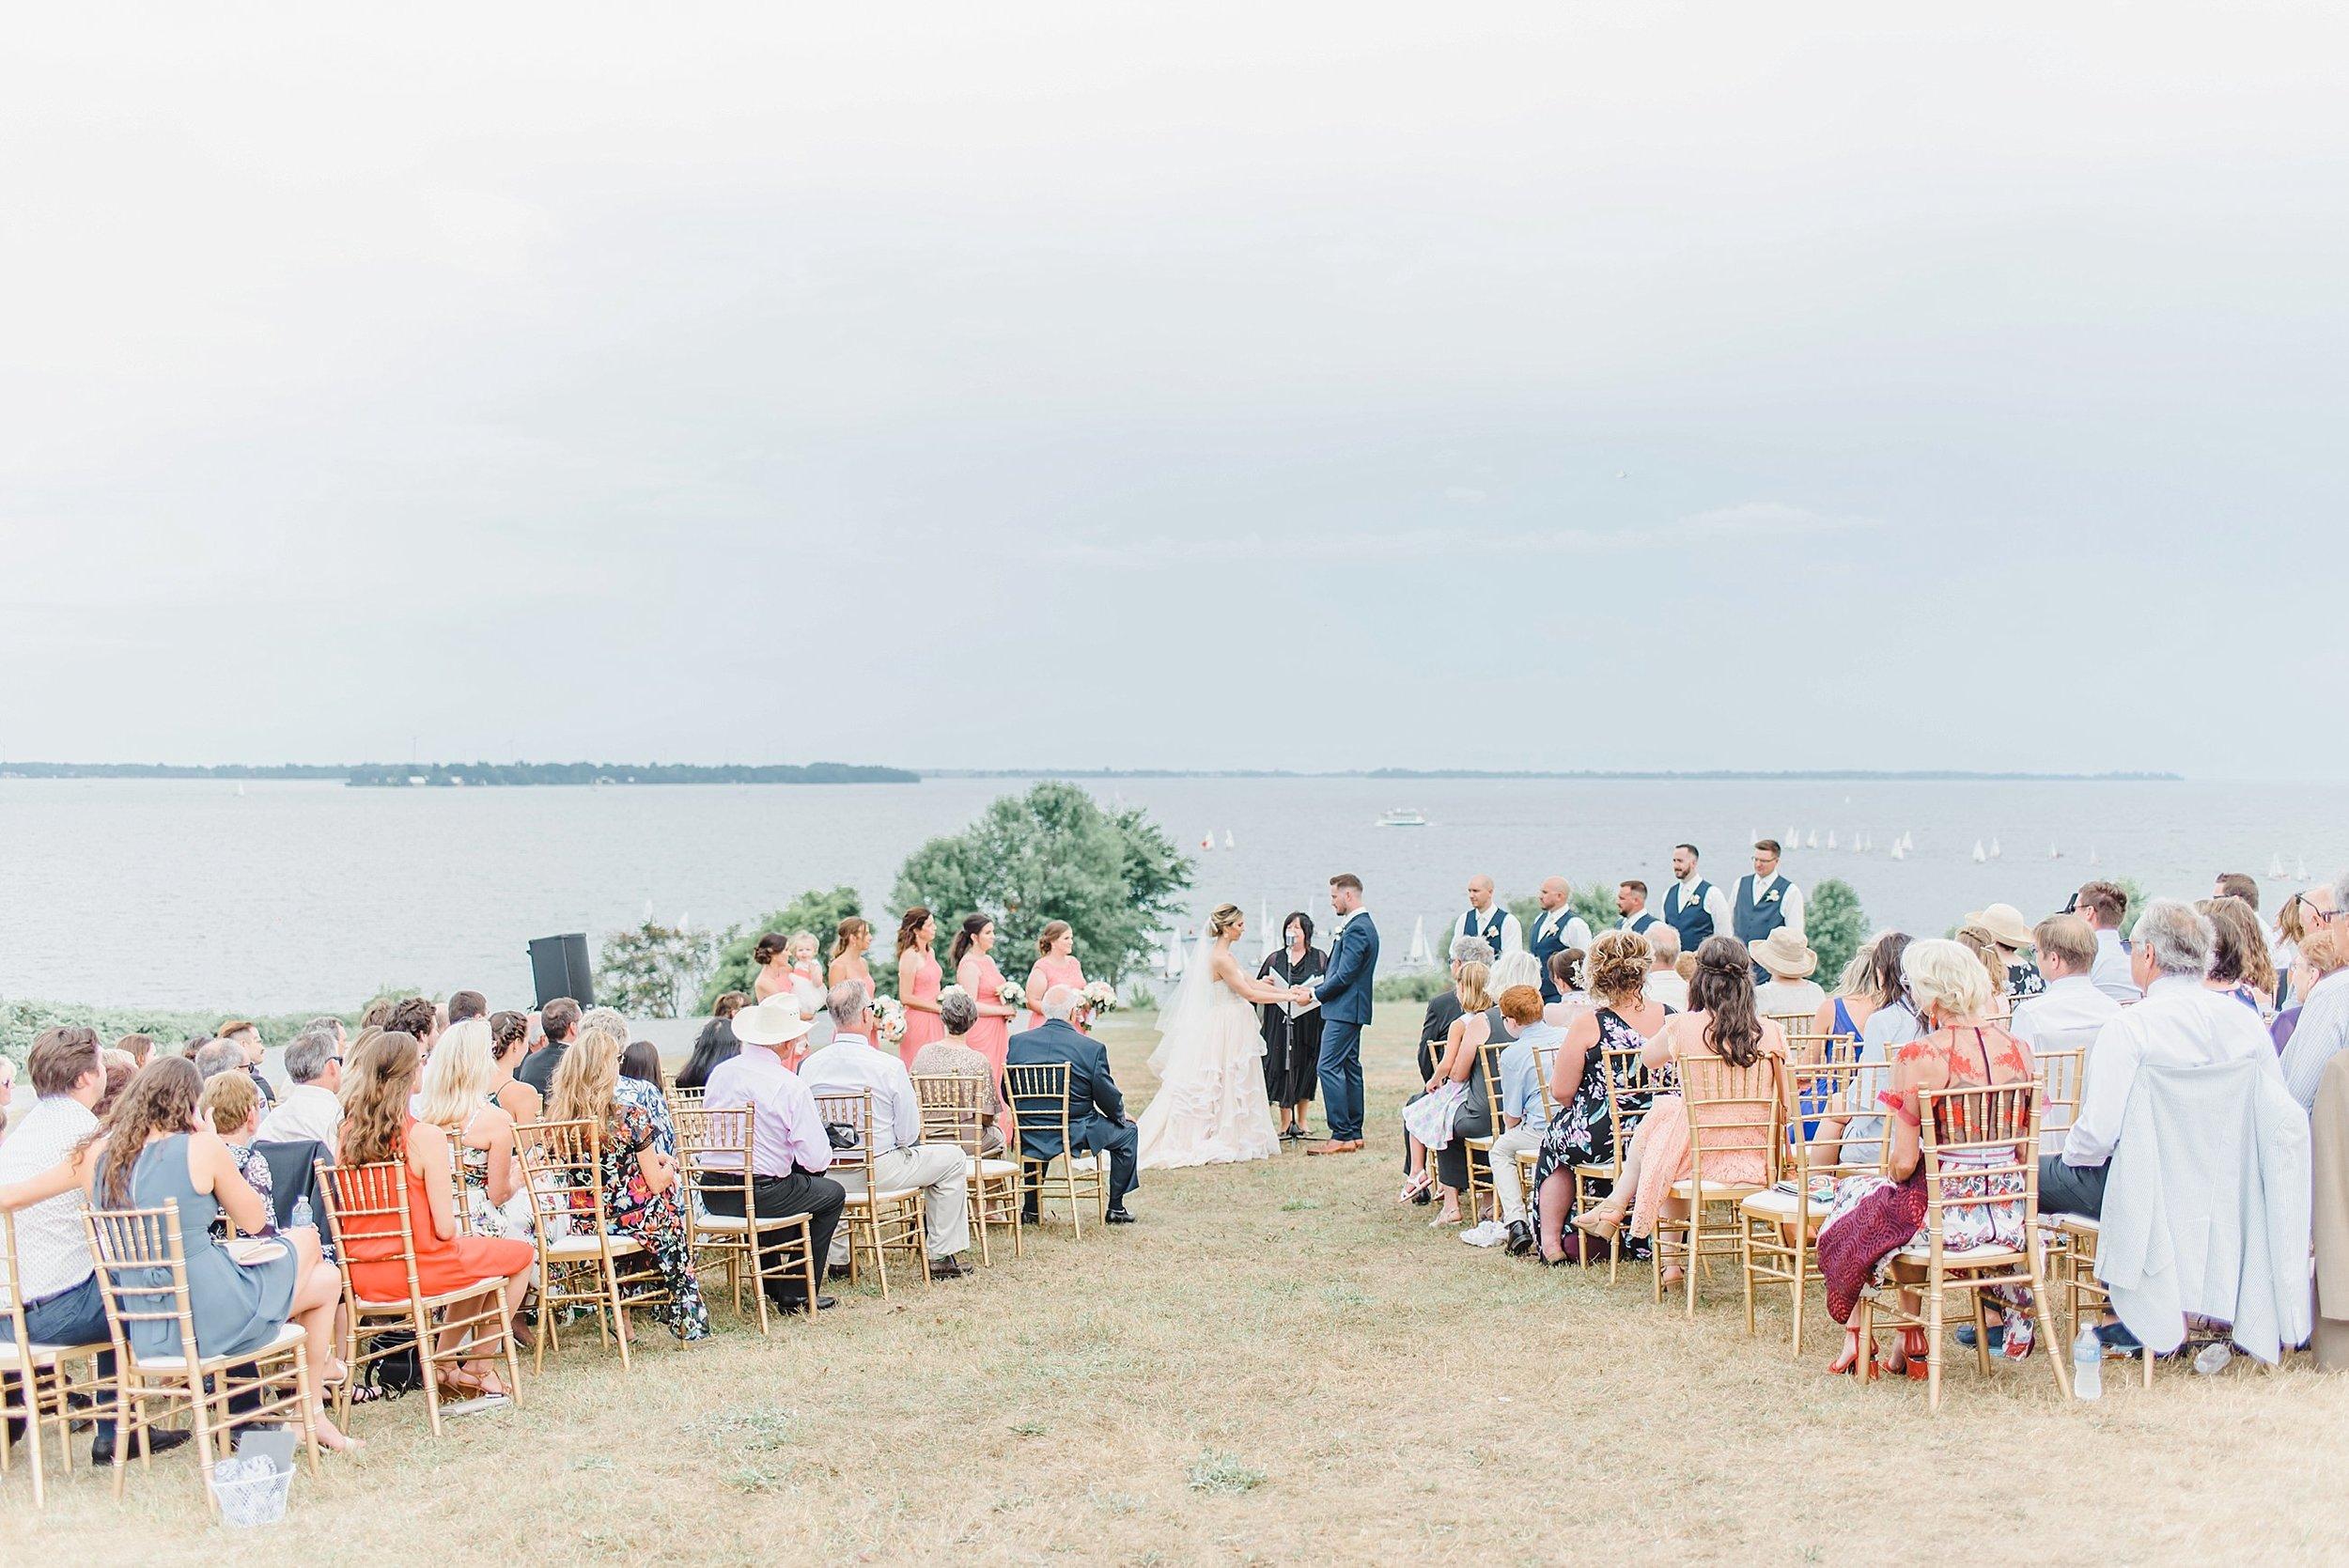 light airy indie fine art ottawa wedding photographer | Ali and Batoul Photography_0183.jpg